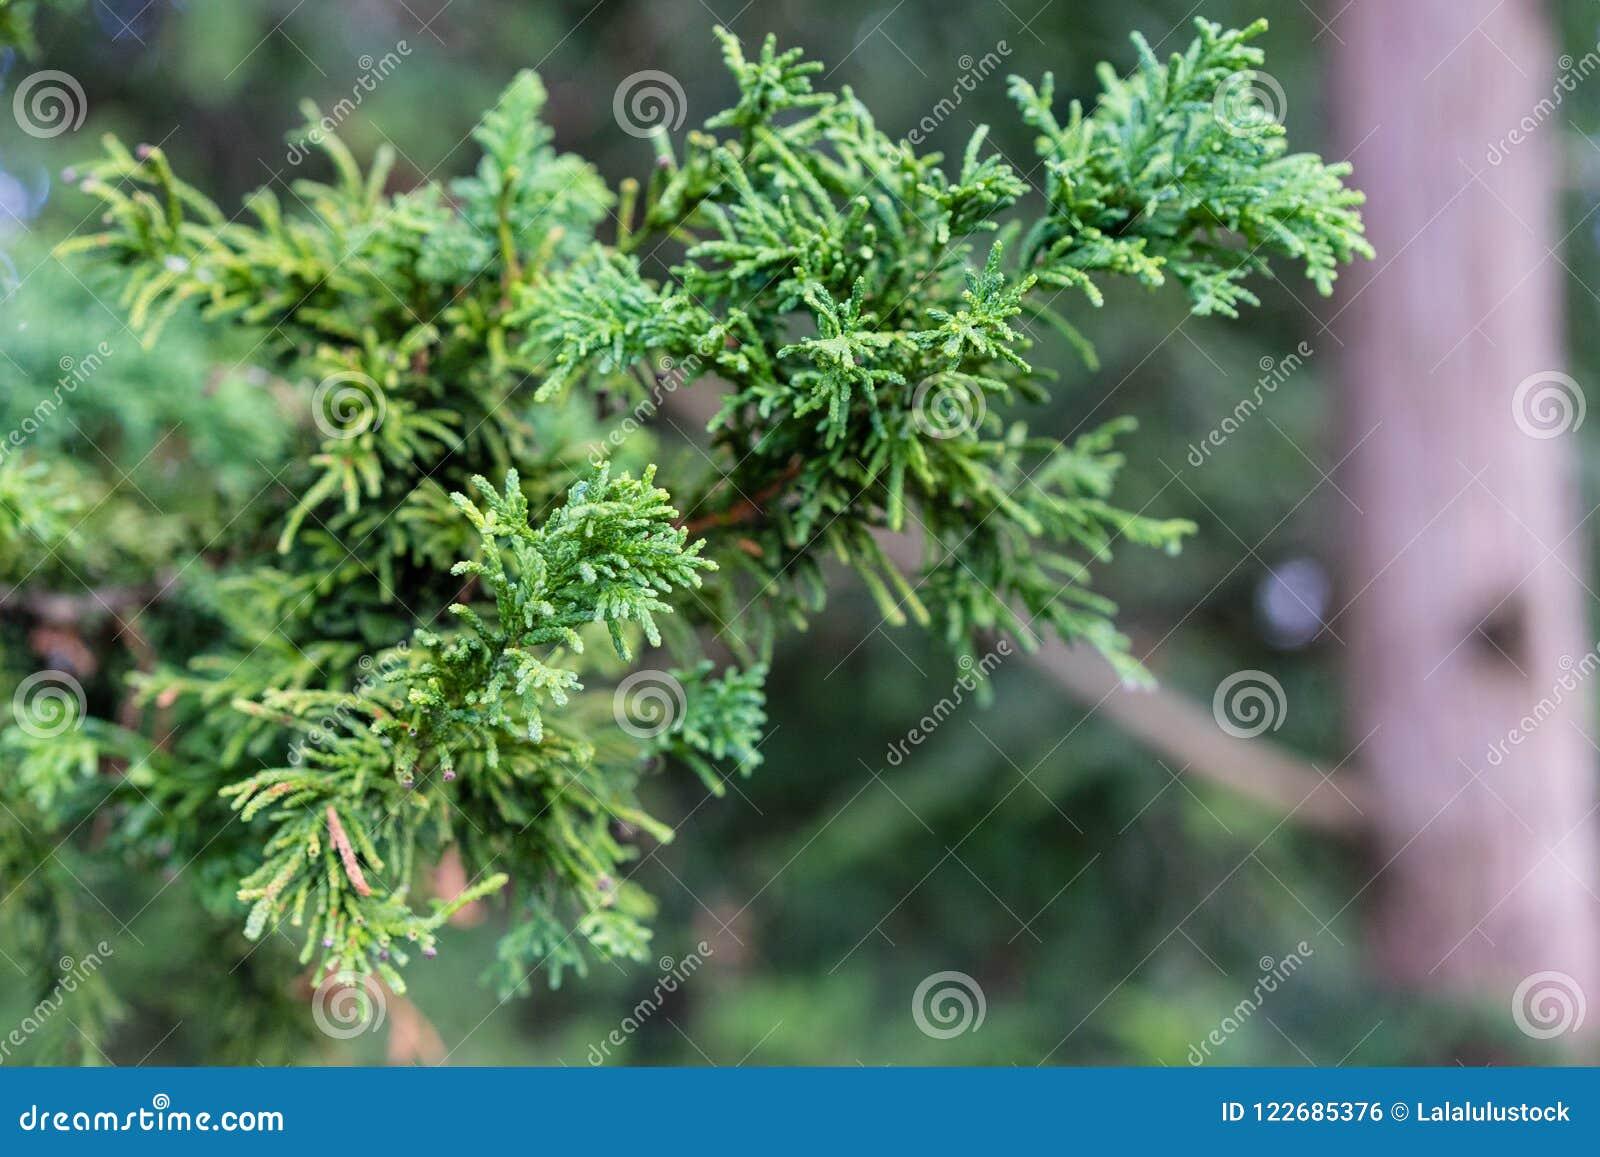 Tak en Blad van de Dwerghinoki-Cipres, chamaecyparis obtusa, Nana Gracilis